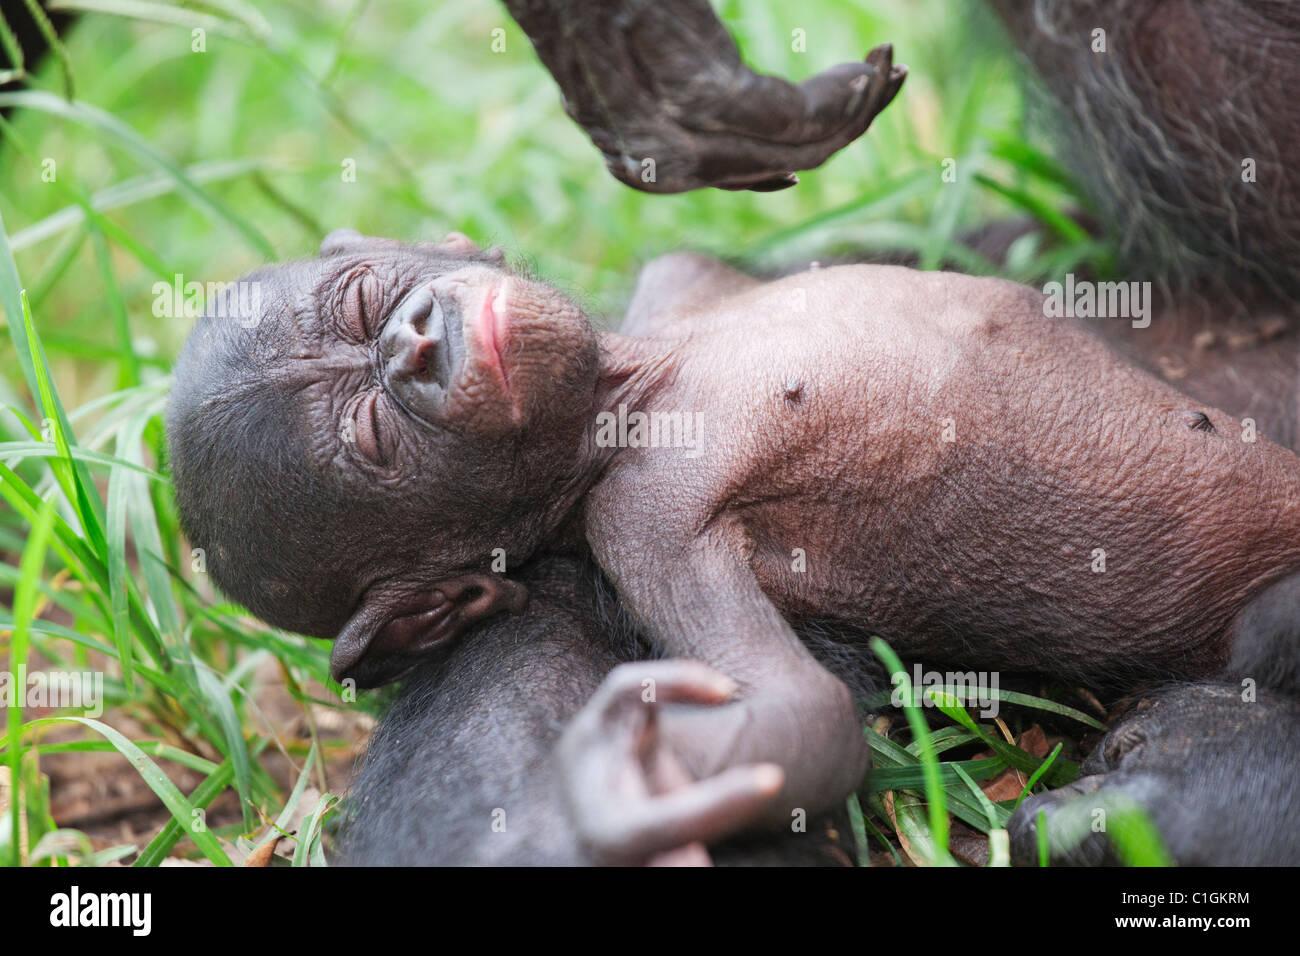 Mother and baby Bonobo Chimpanzee at the Sanctuary Lola Ya Bonobo, Democratic Republic of the Congo - Stock Image